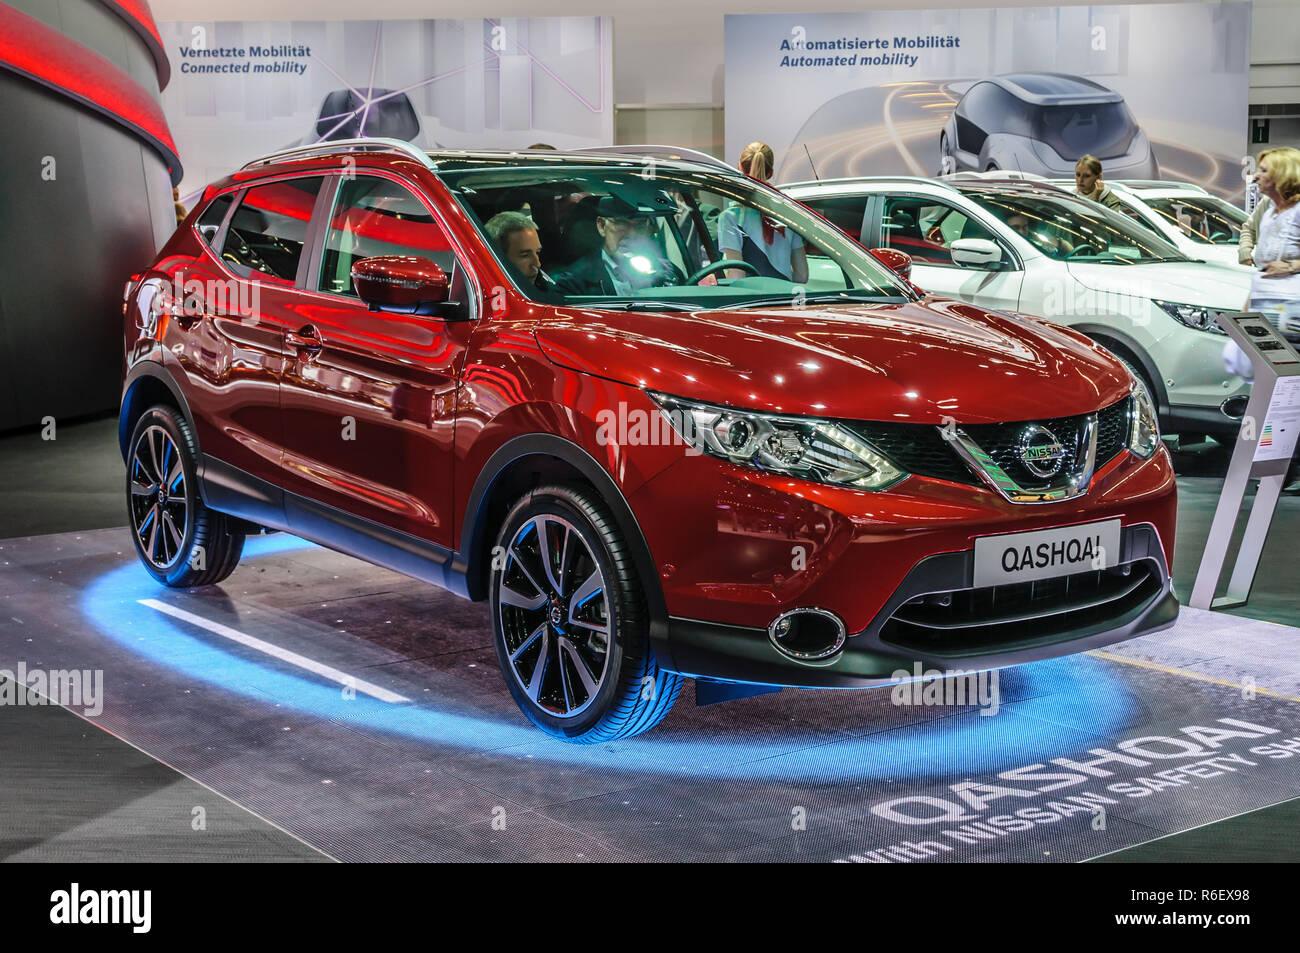 FRANKFURT - SEPT 2015: Nissan Qashqai presented at IAA International Motor Show on September 20, 2015 in Frankfurt, Germany - Stock Image